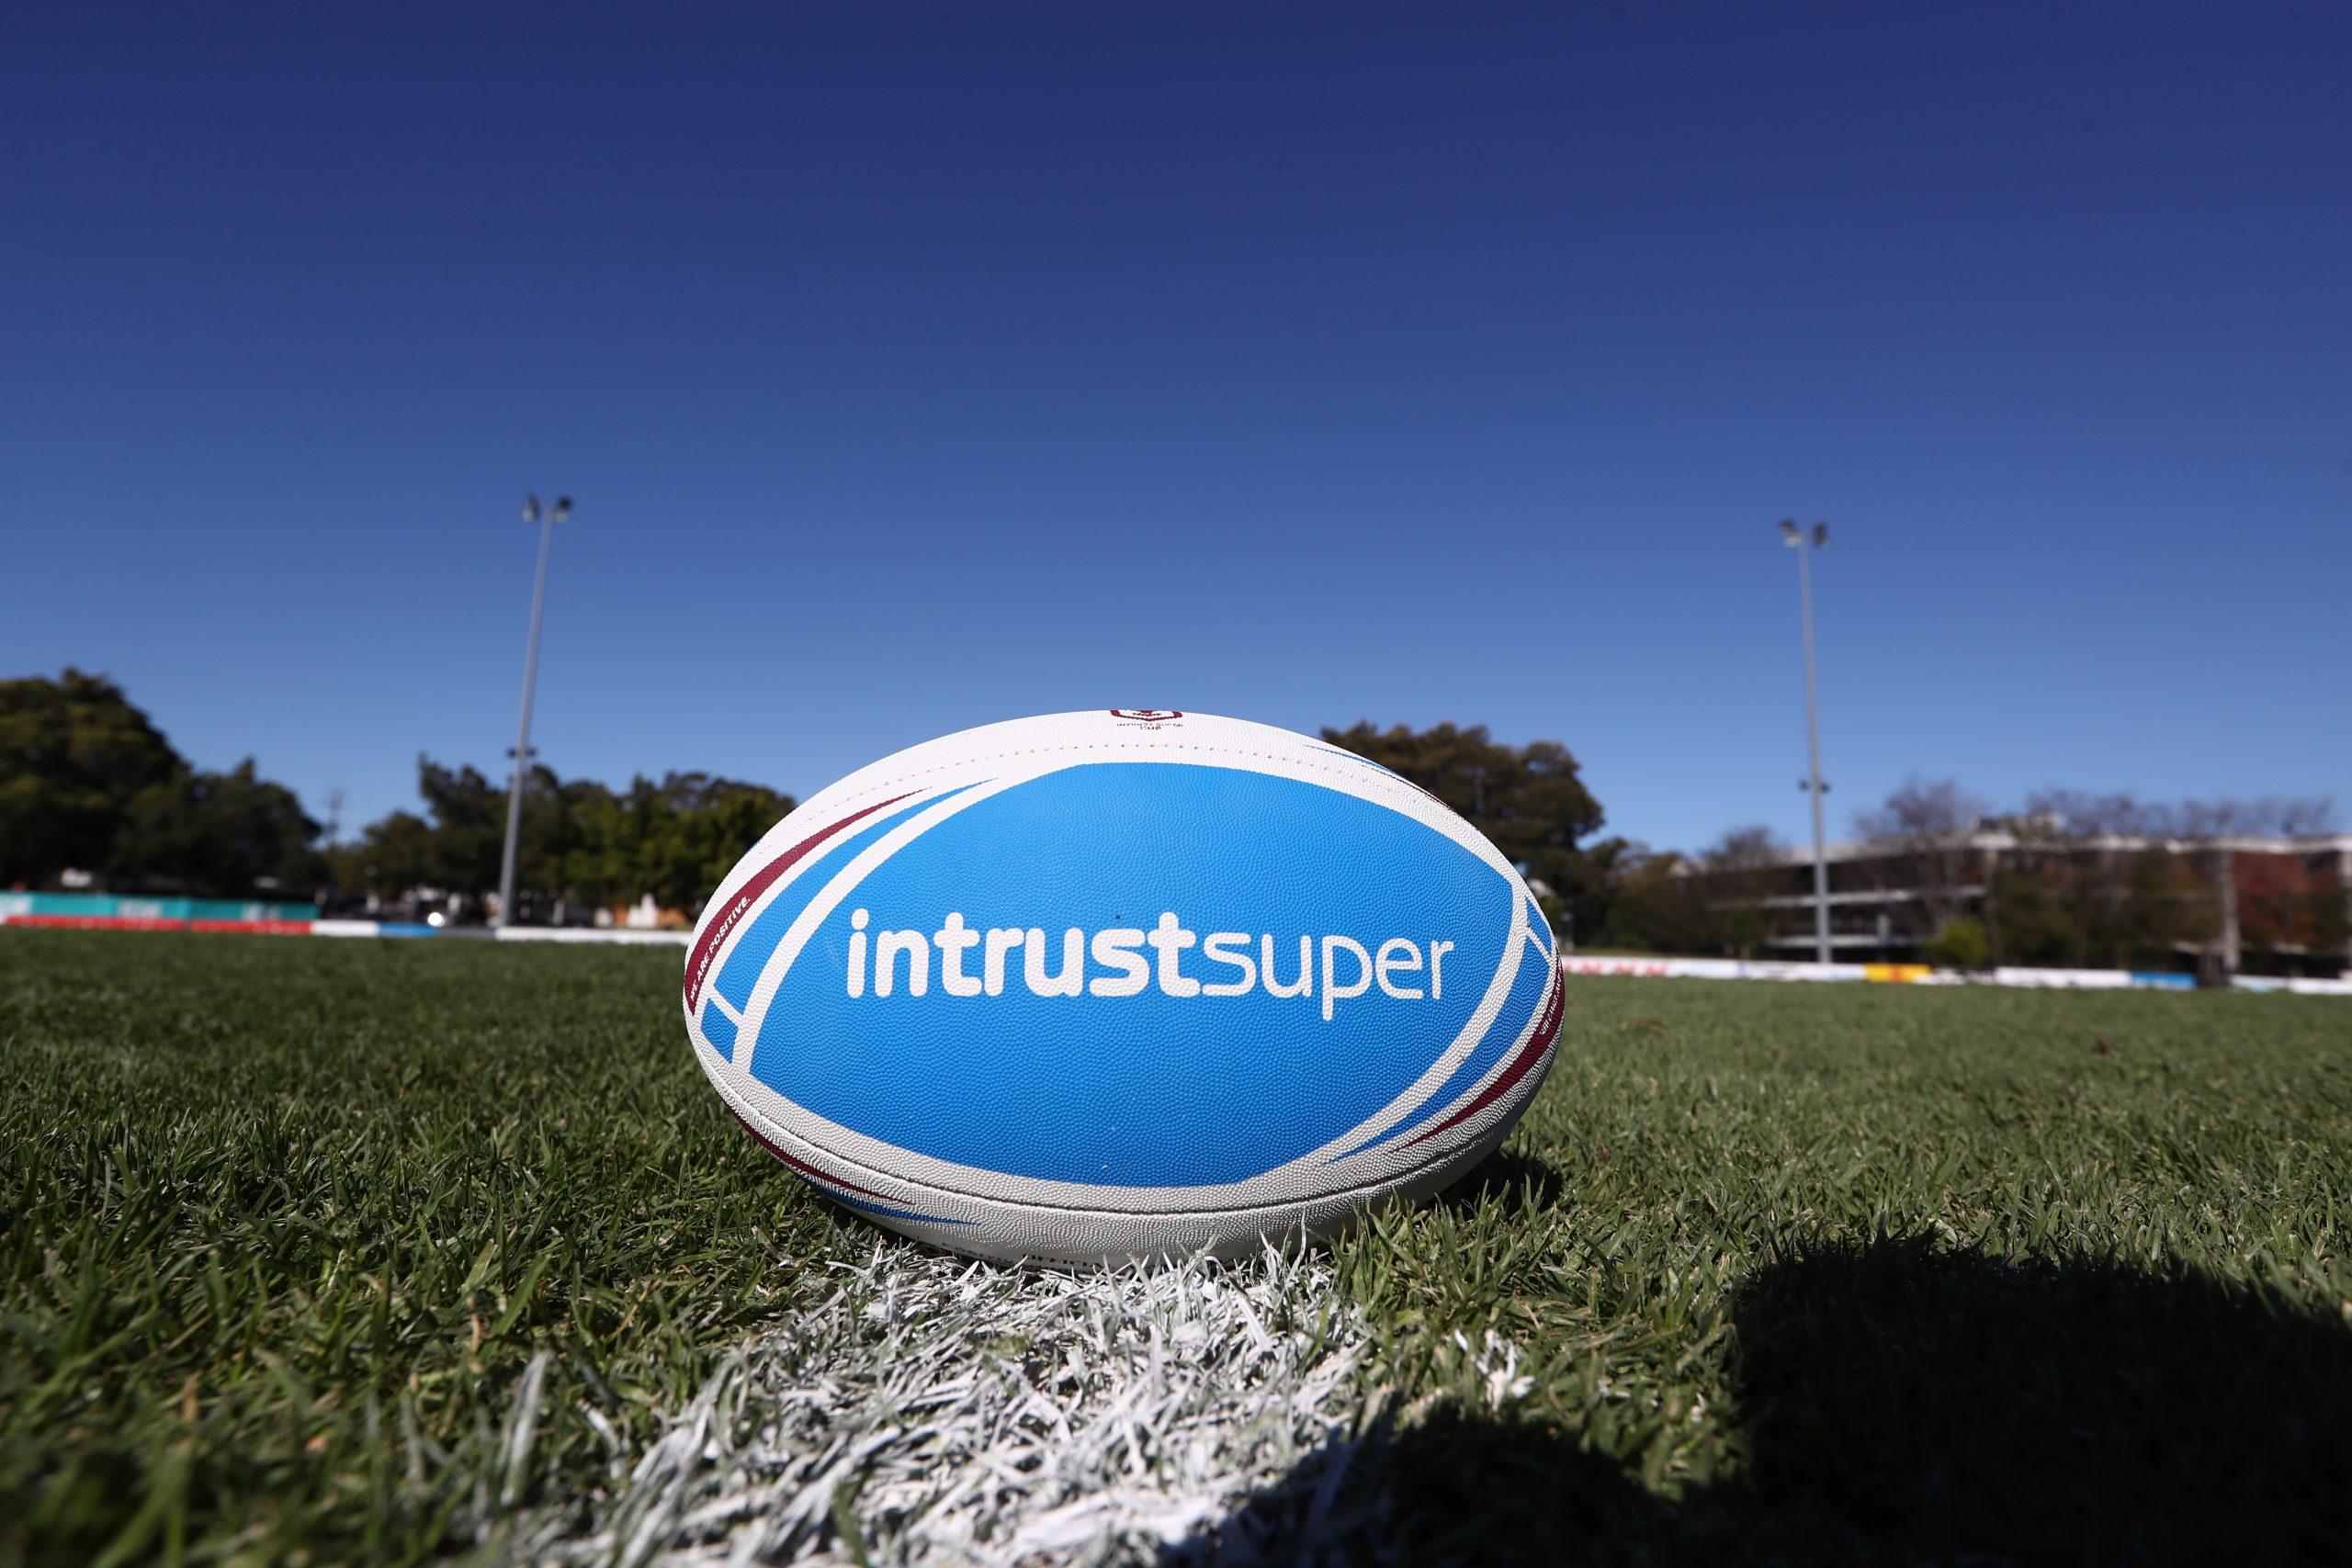 Weekend Intrust Super Cup matches cancelled